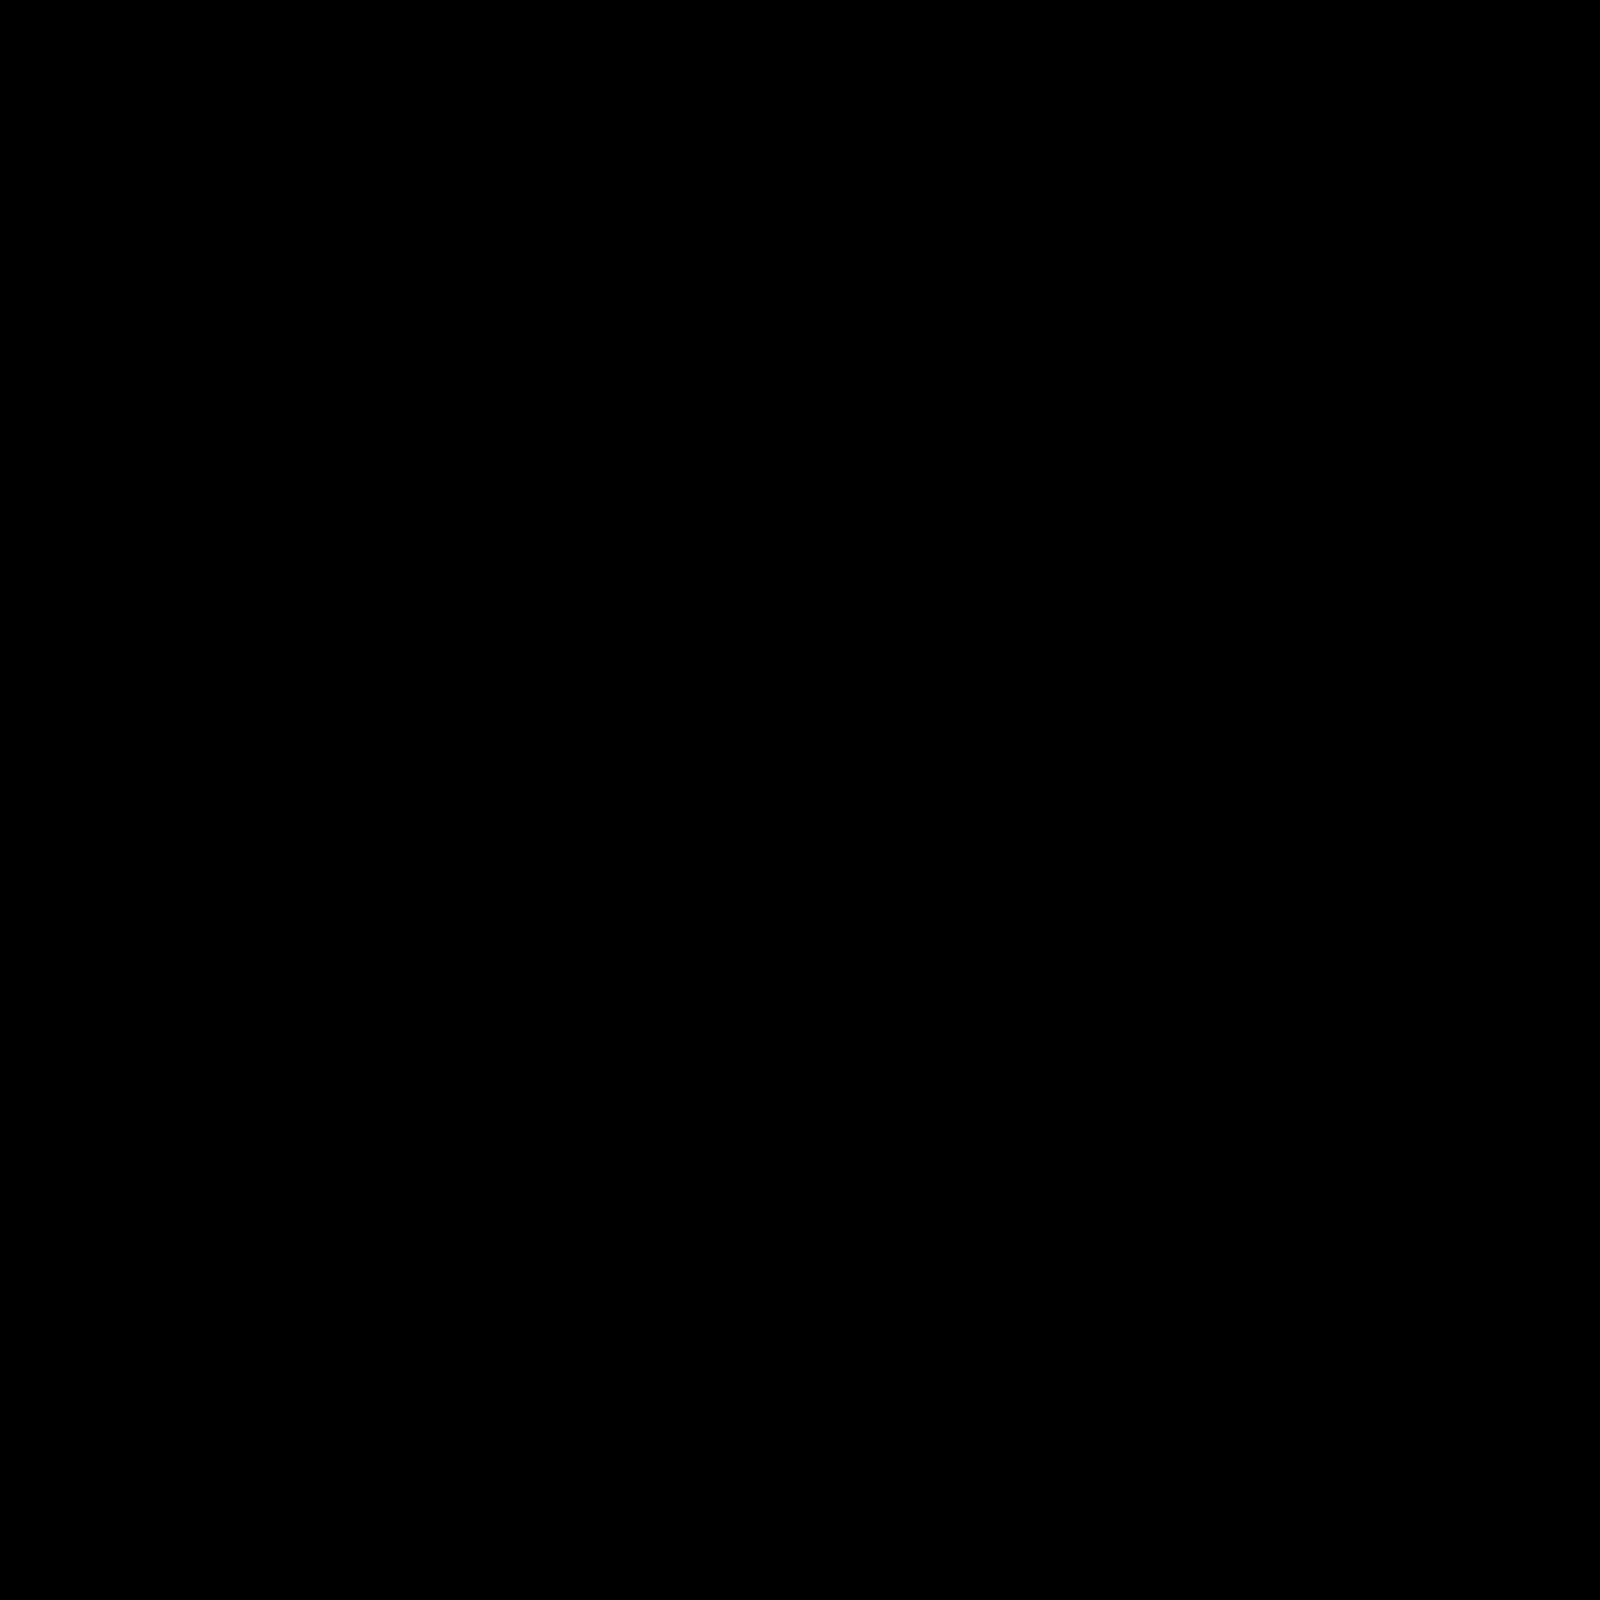 Tartoplorus